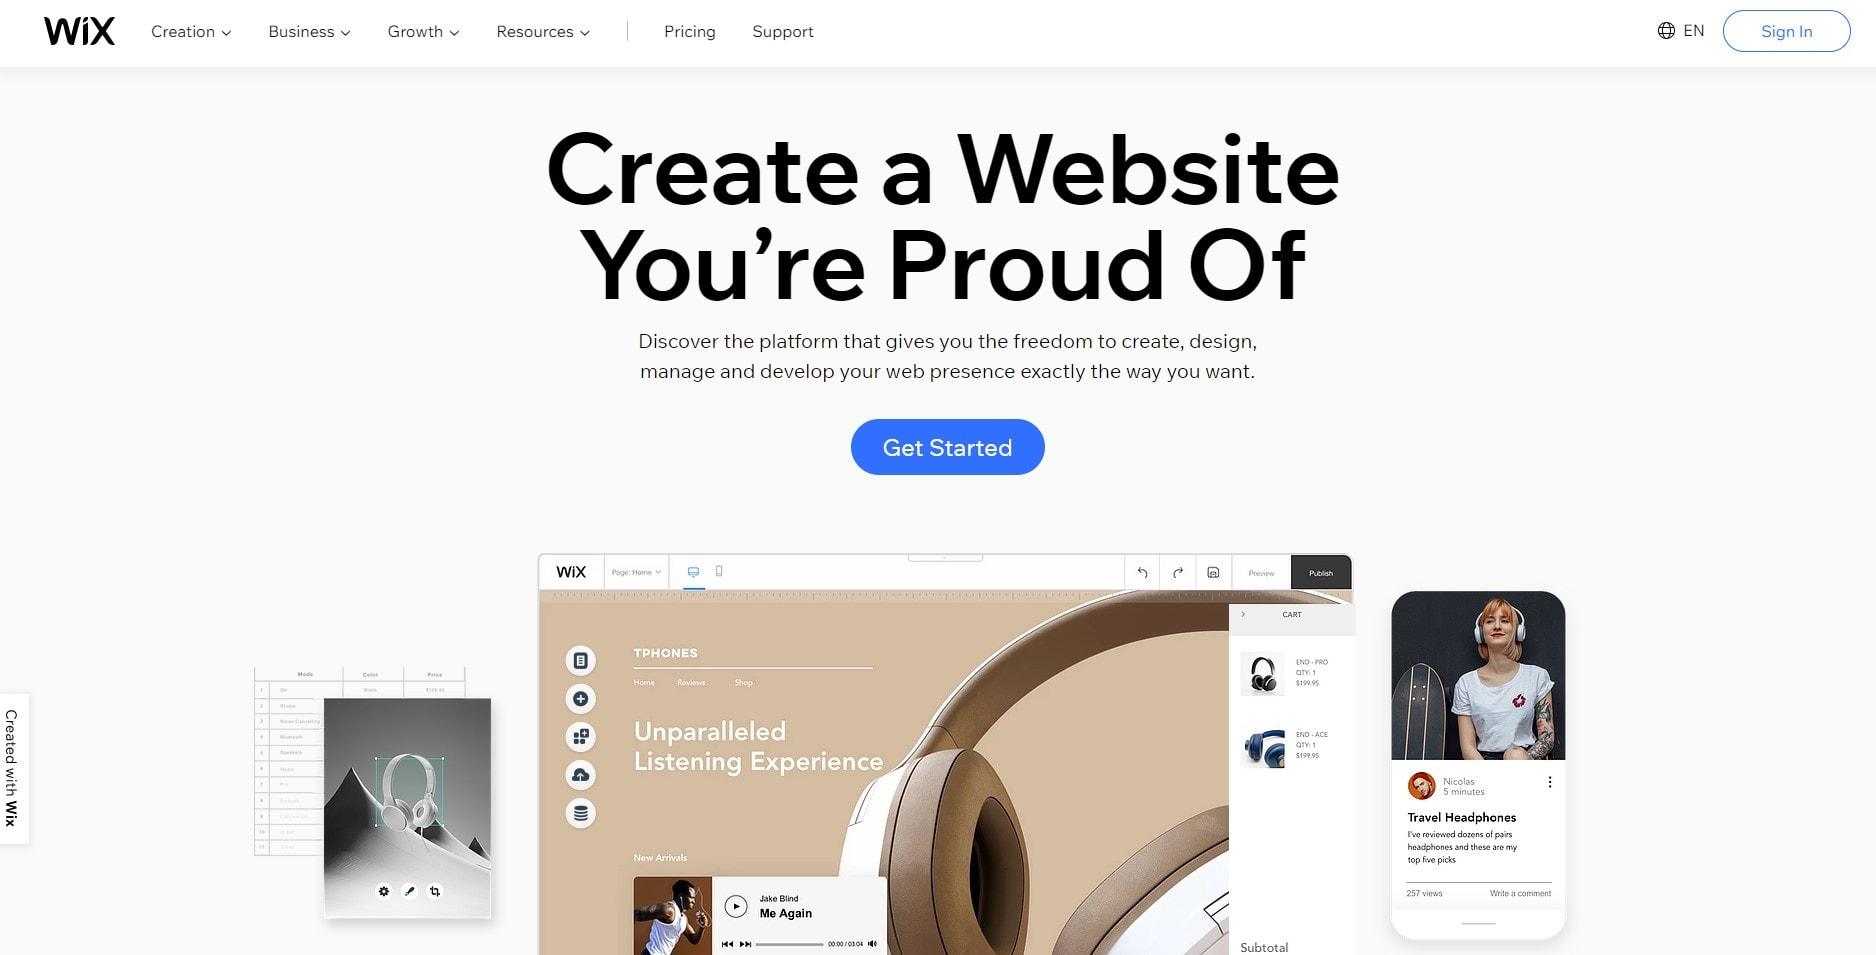 the wix.com home page